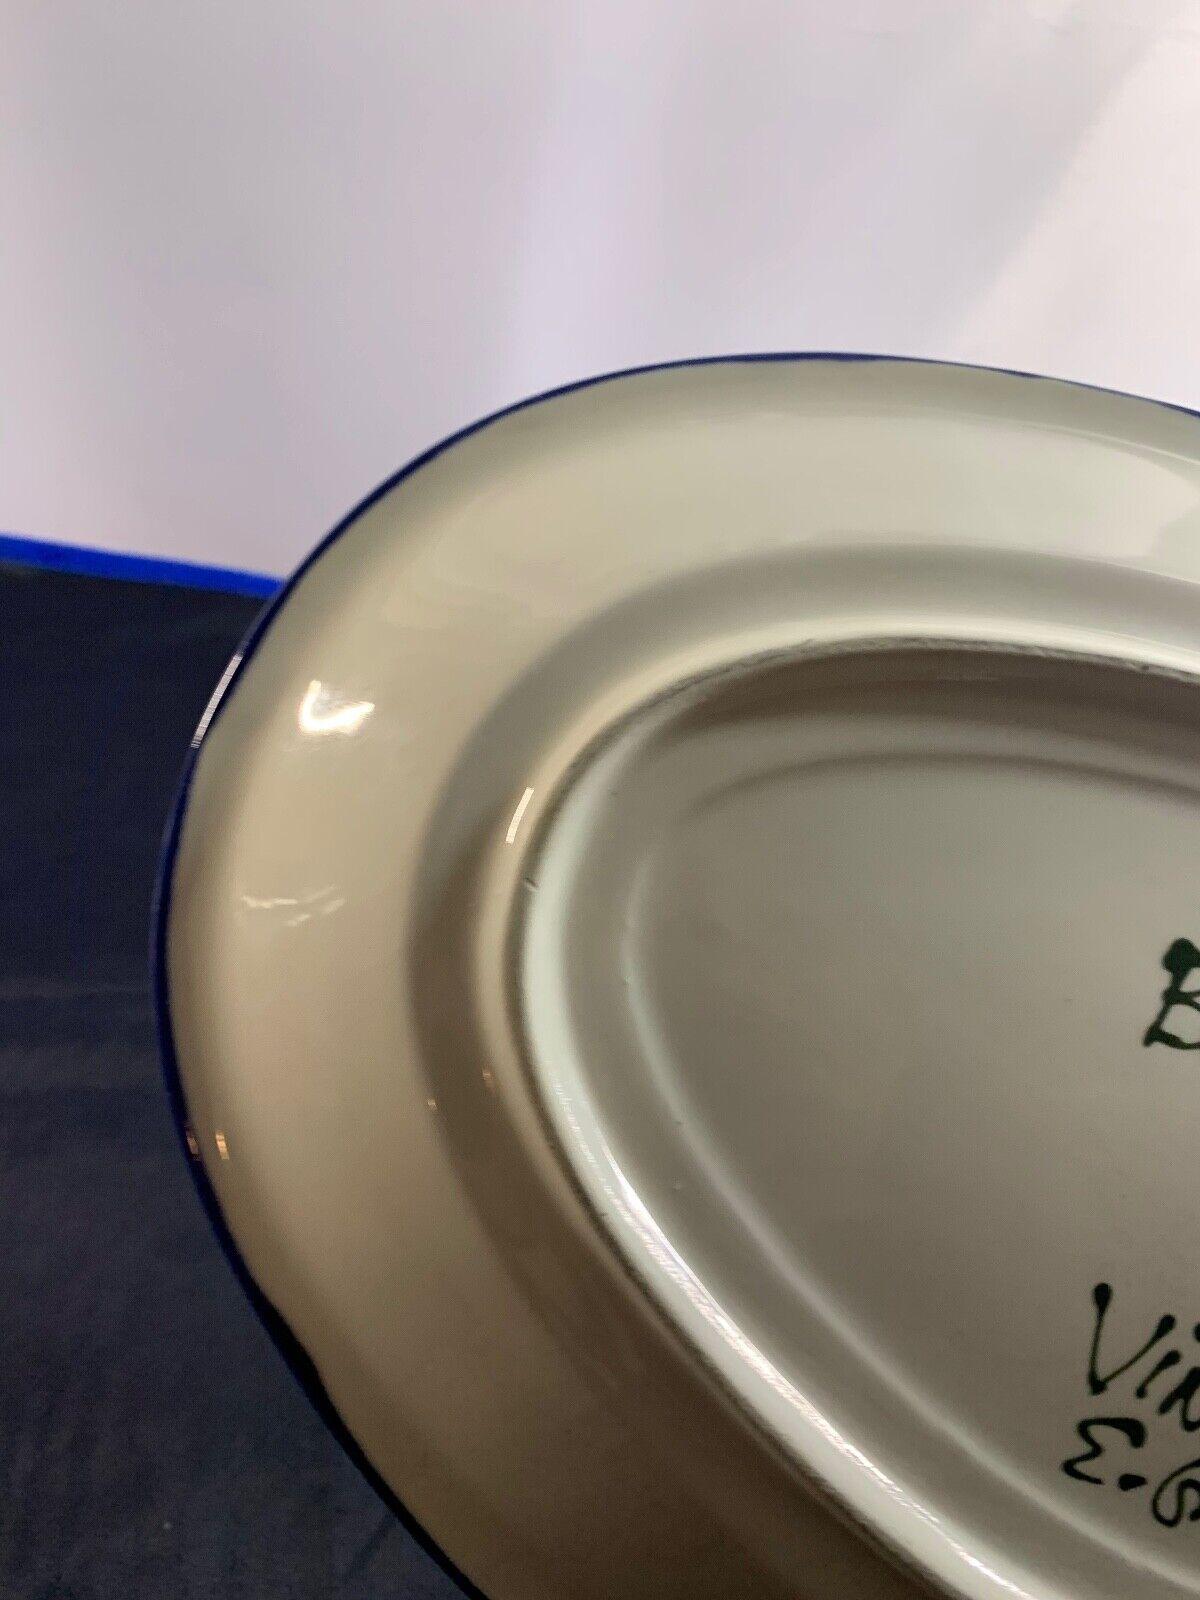 BENZIGER VINEYARD GRAPE VINE PRINT PLATTER DISH 12 X 9 BY E. GREENE - $39.99